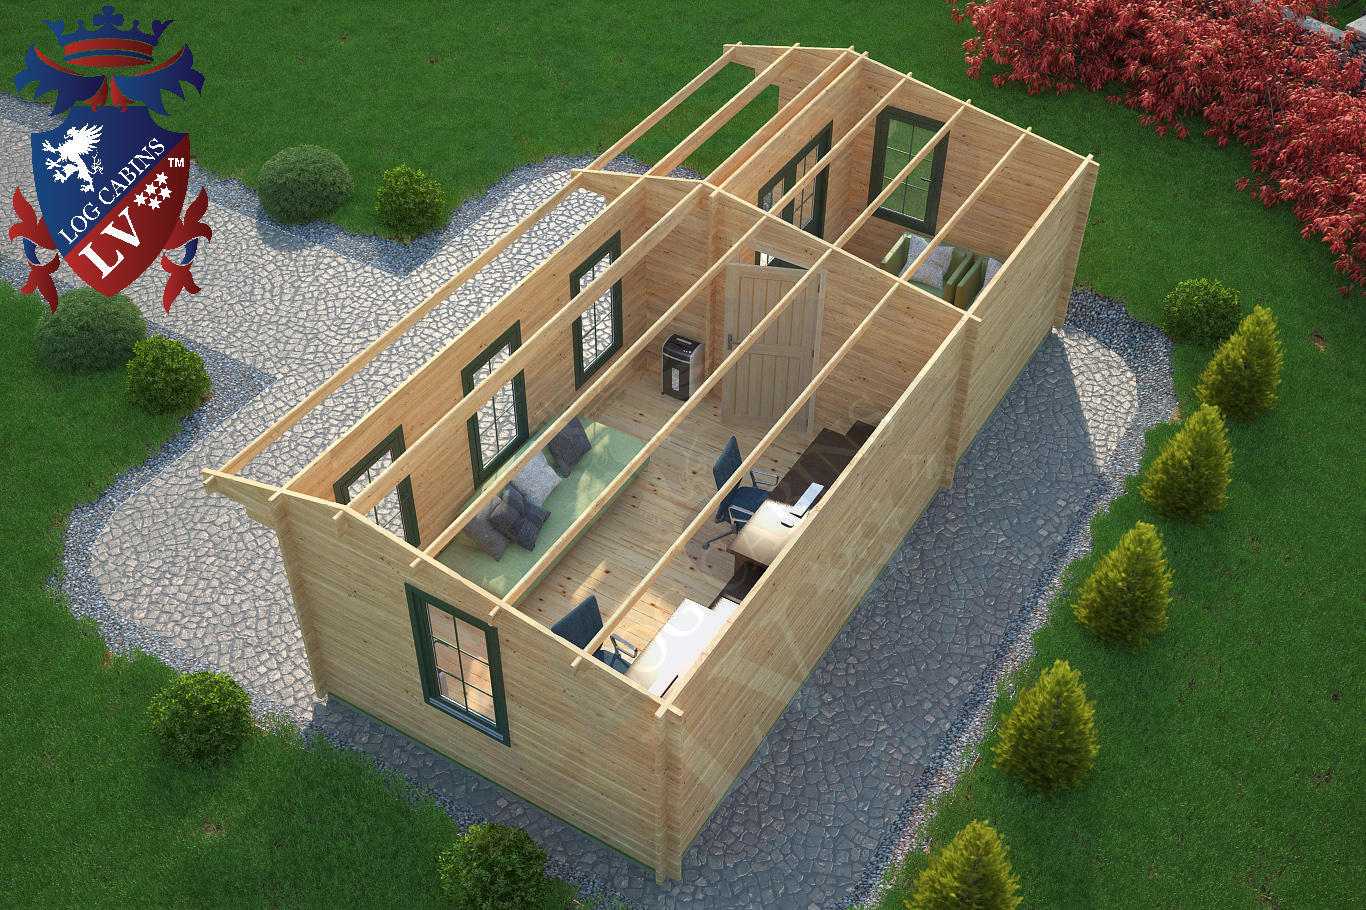 Log Cabins 8.0m x 3.5m 5